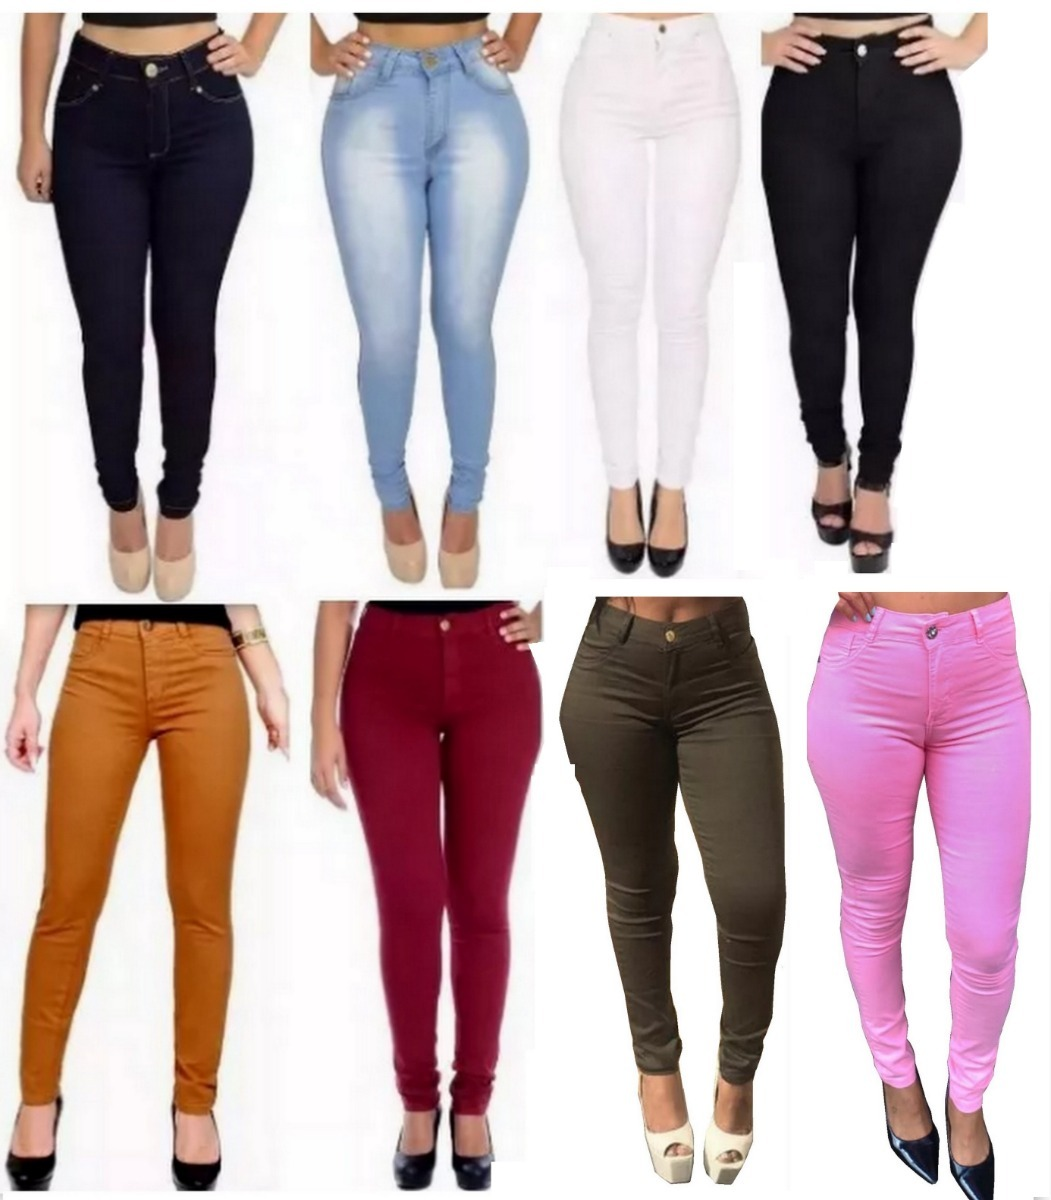 ea2ae27a5 calça jeans cintura alta hot pant moda feminina mulher+brind. Carregando  zoom.